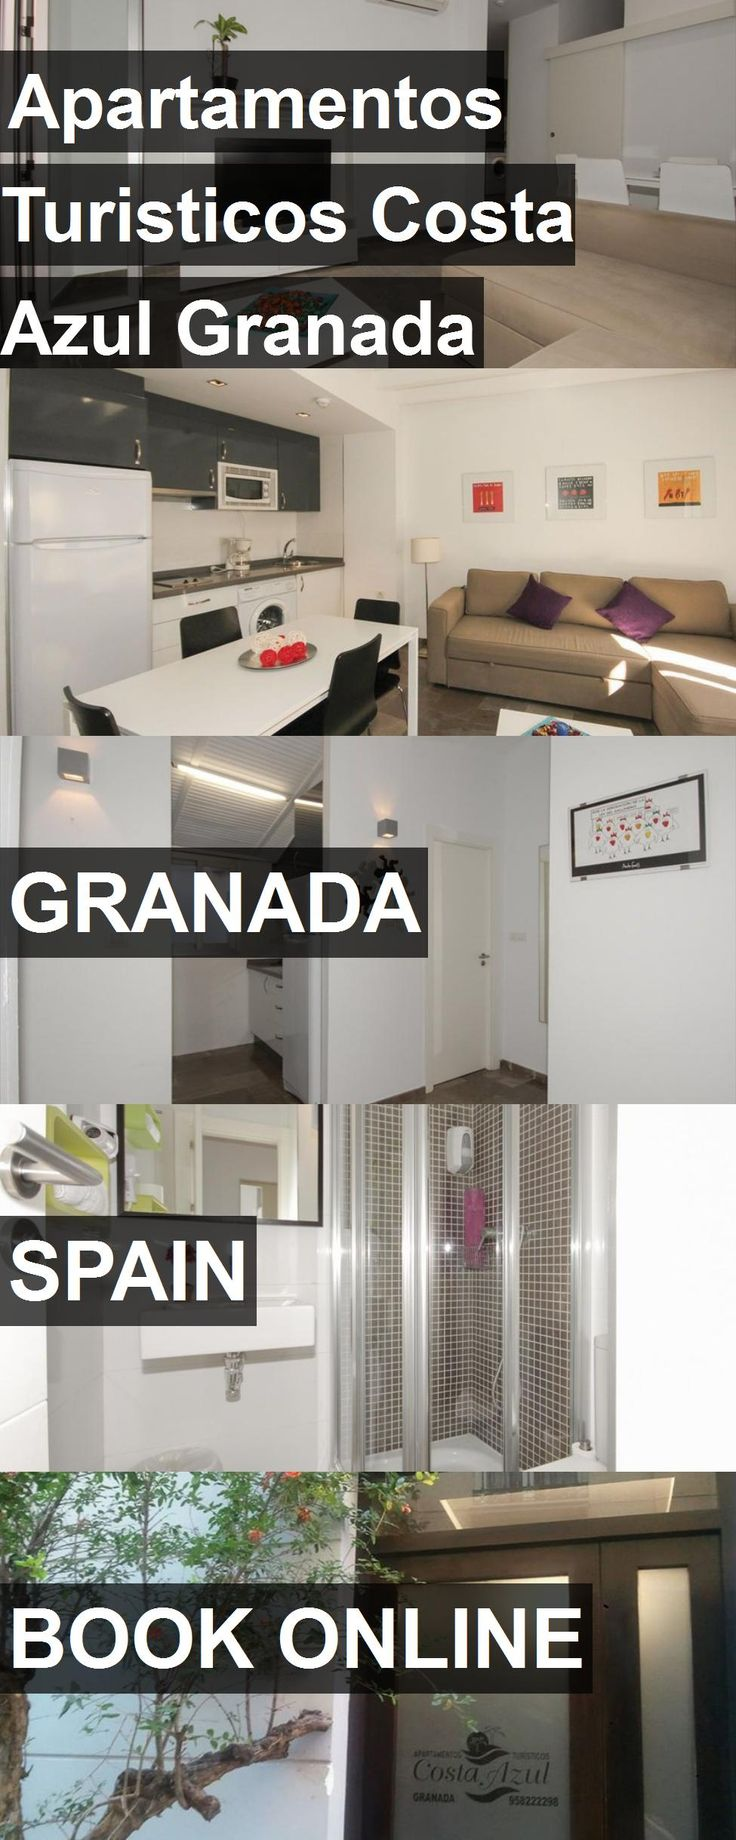 Hotel Apartamentos Turisticos Costa Azul Granada in Granada, Spain. For more information, photos, reviews and best prices please follow the link. #Spain #Granada #travel #vacation #hotel